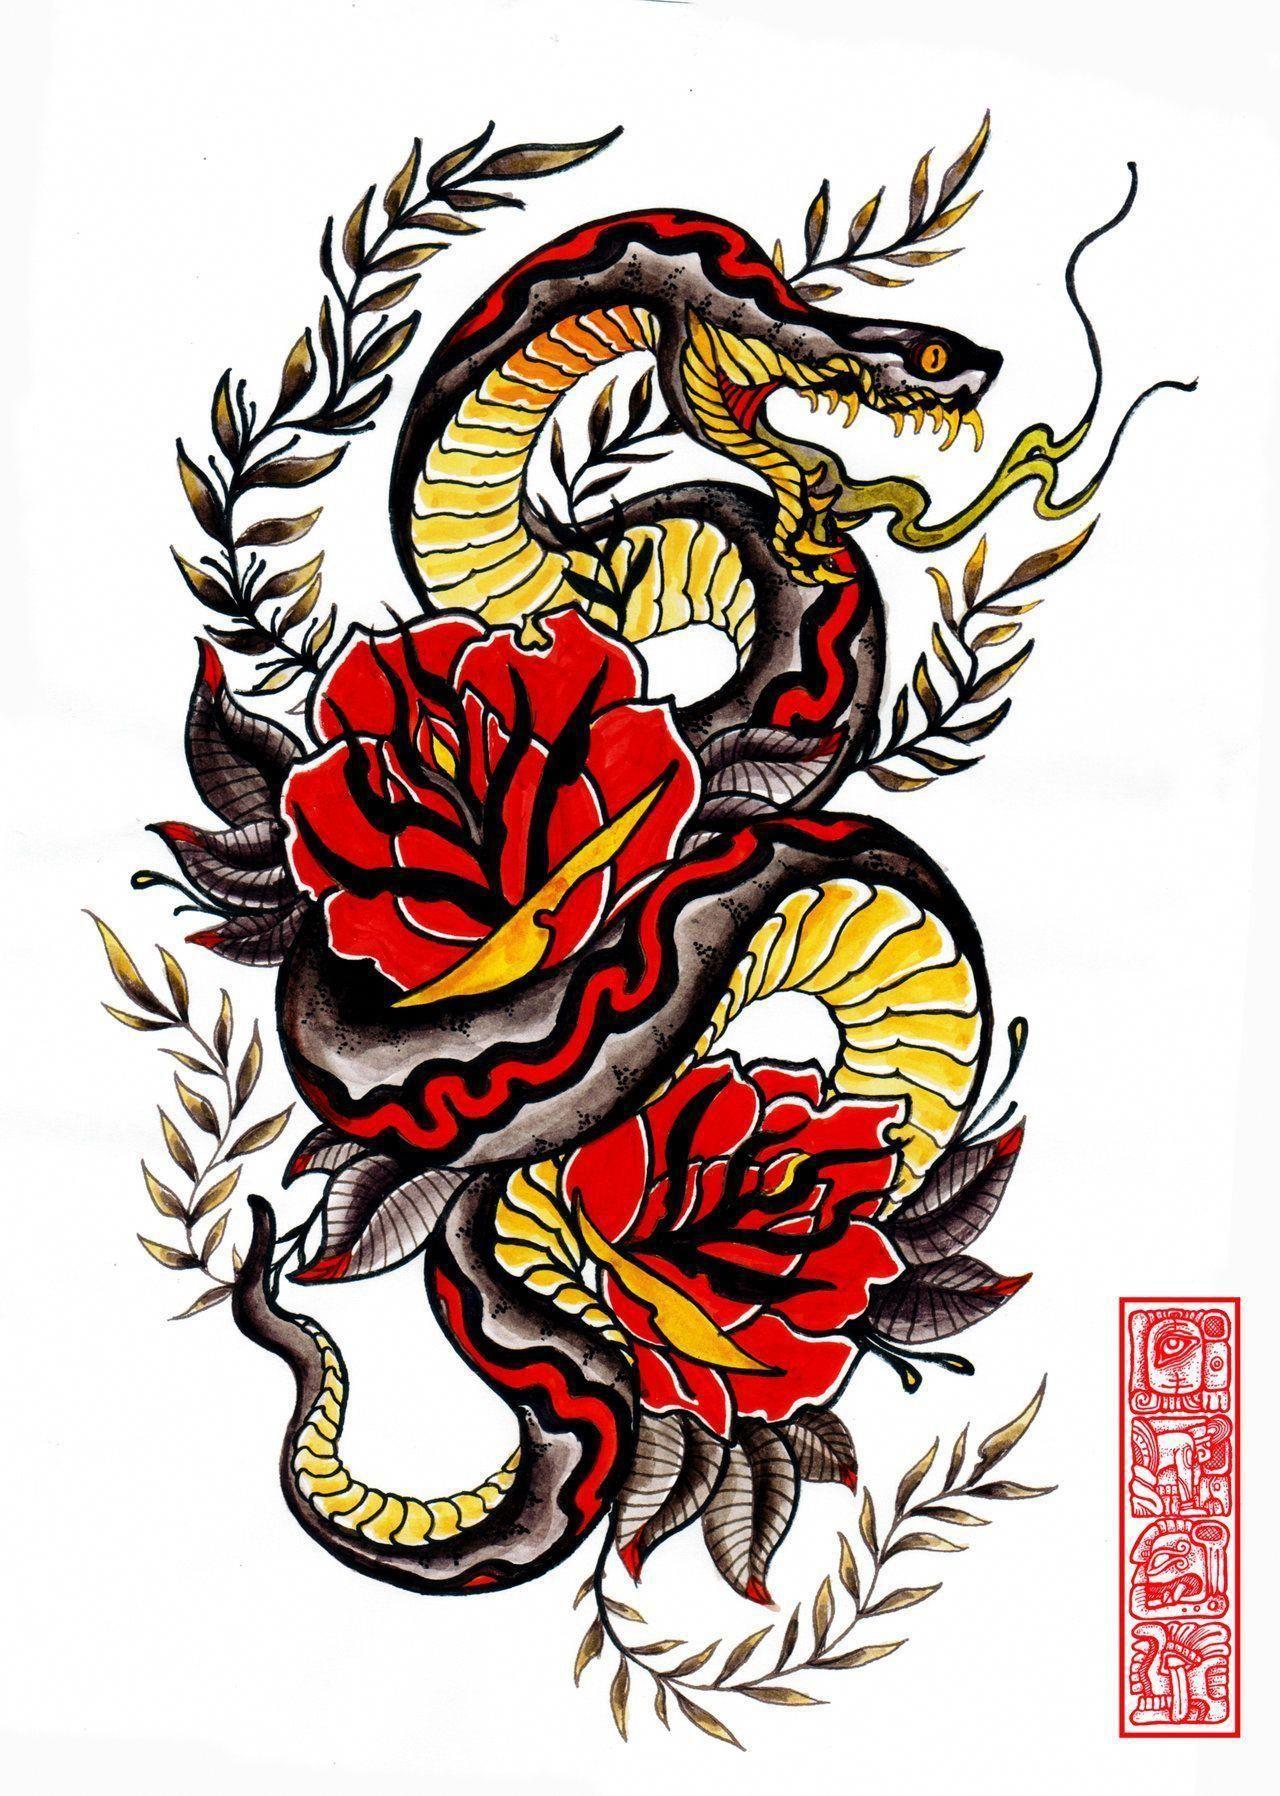 Japanese Tattoos And Meanings Japanesetattoos Snake Tattoo Design Traditional Snake Tattoo Japanese Snake Tattoo